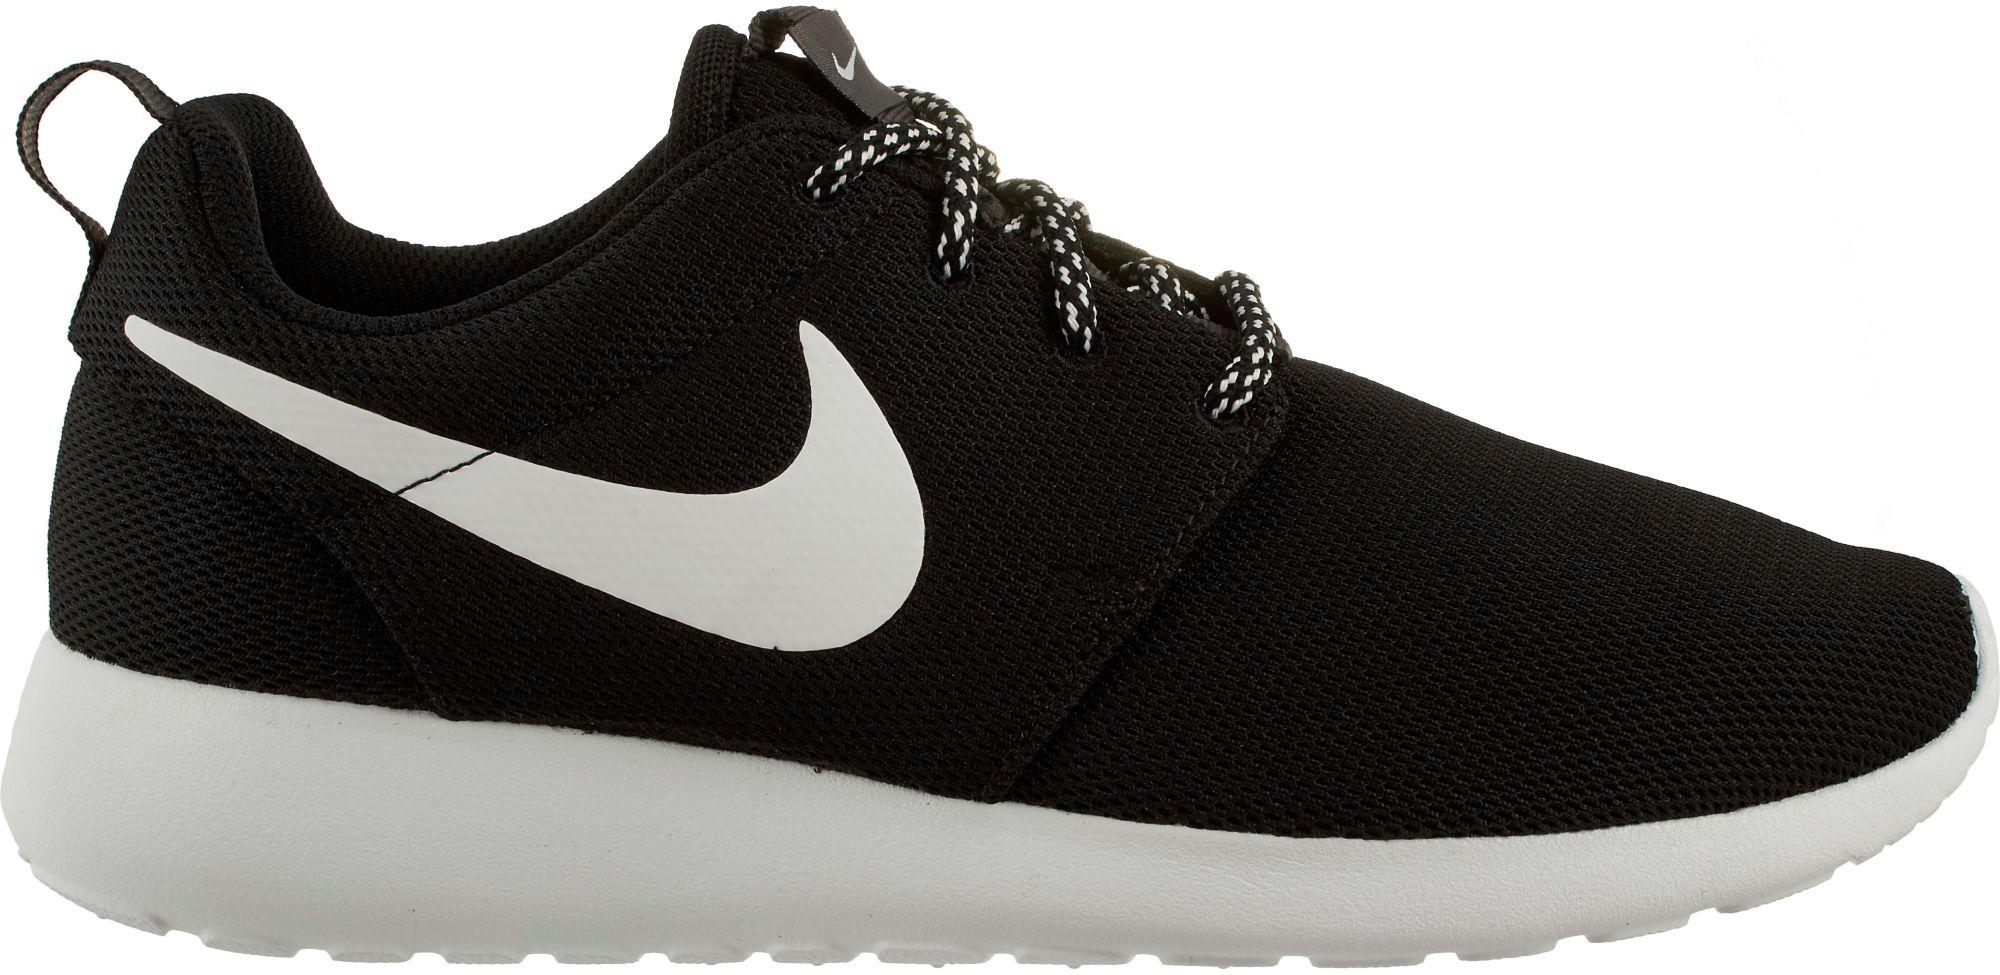 Nike Women's Roshe One Shoes | DICK'S Sporting